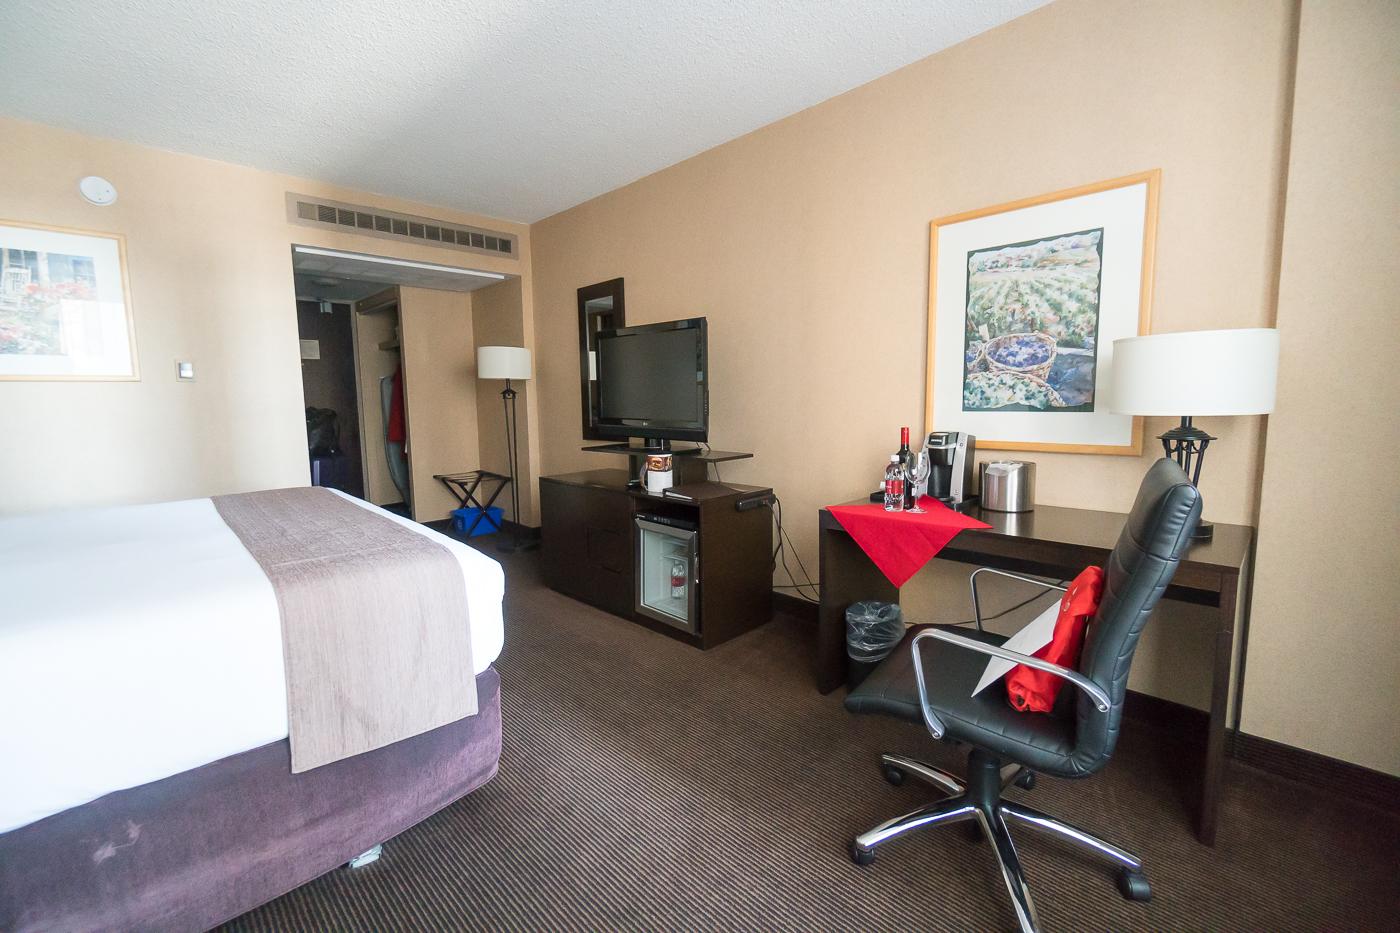 Chambre et bureau au Ramada Plaza - Où dormir à Calgary?